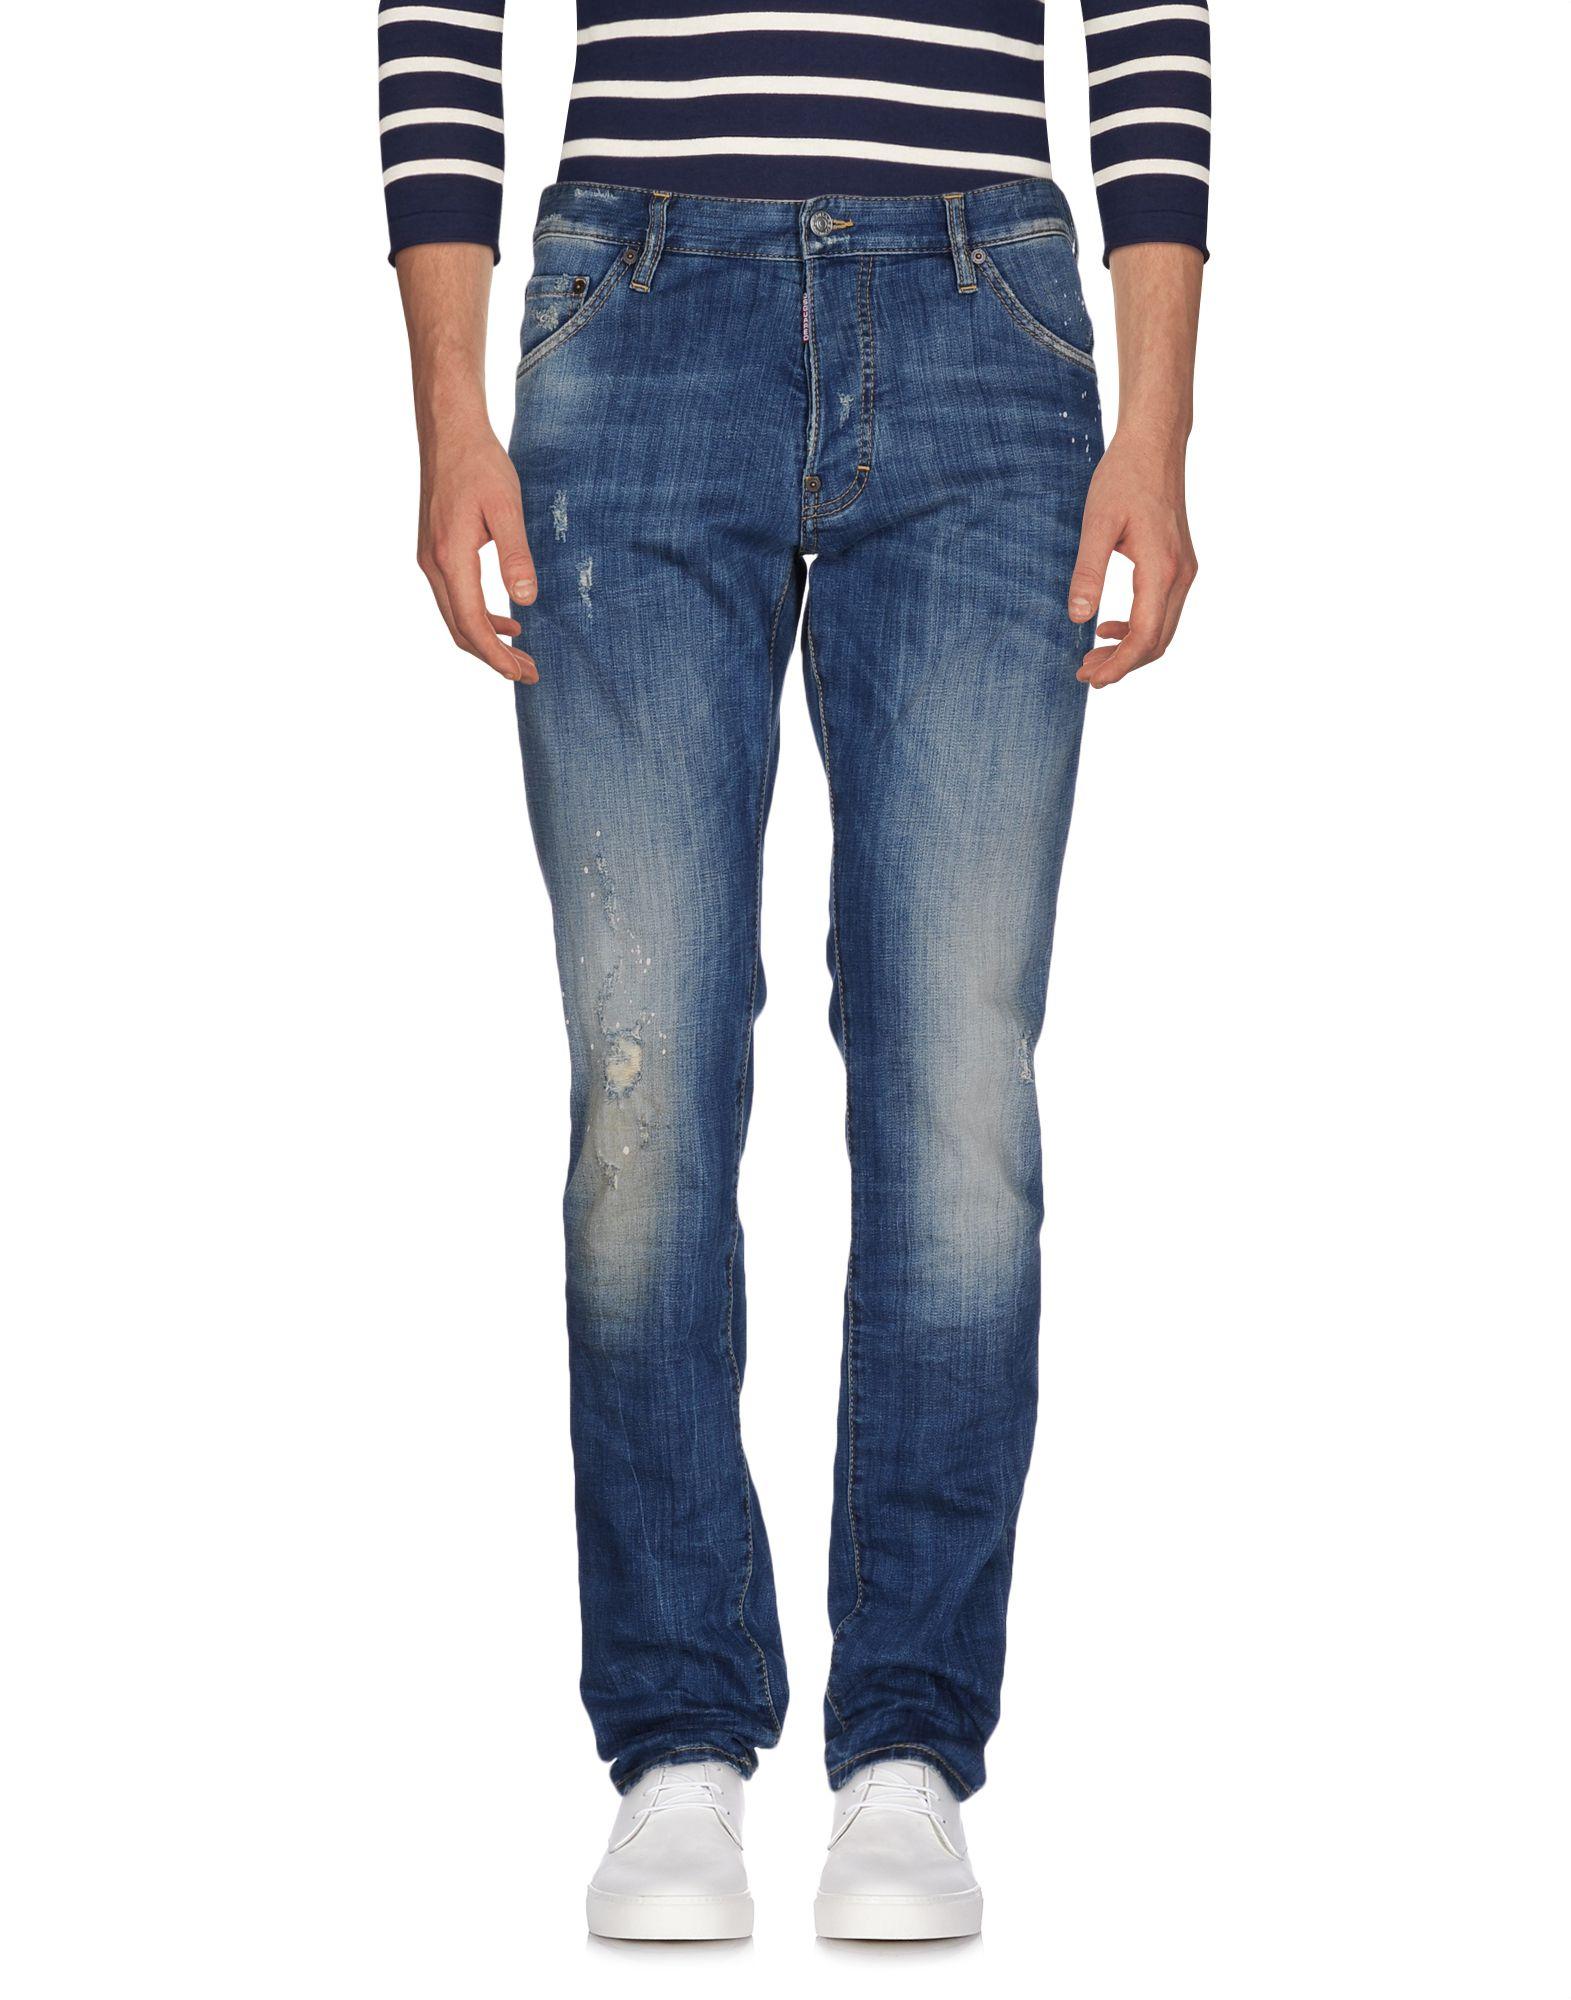 Pantaloni Jeans Dsquarosso2 Dsquarosso2 Dsquarosso2 uomo - 42570486DM fe9